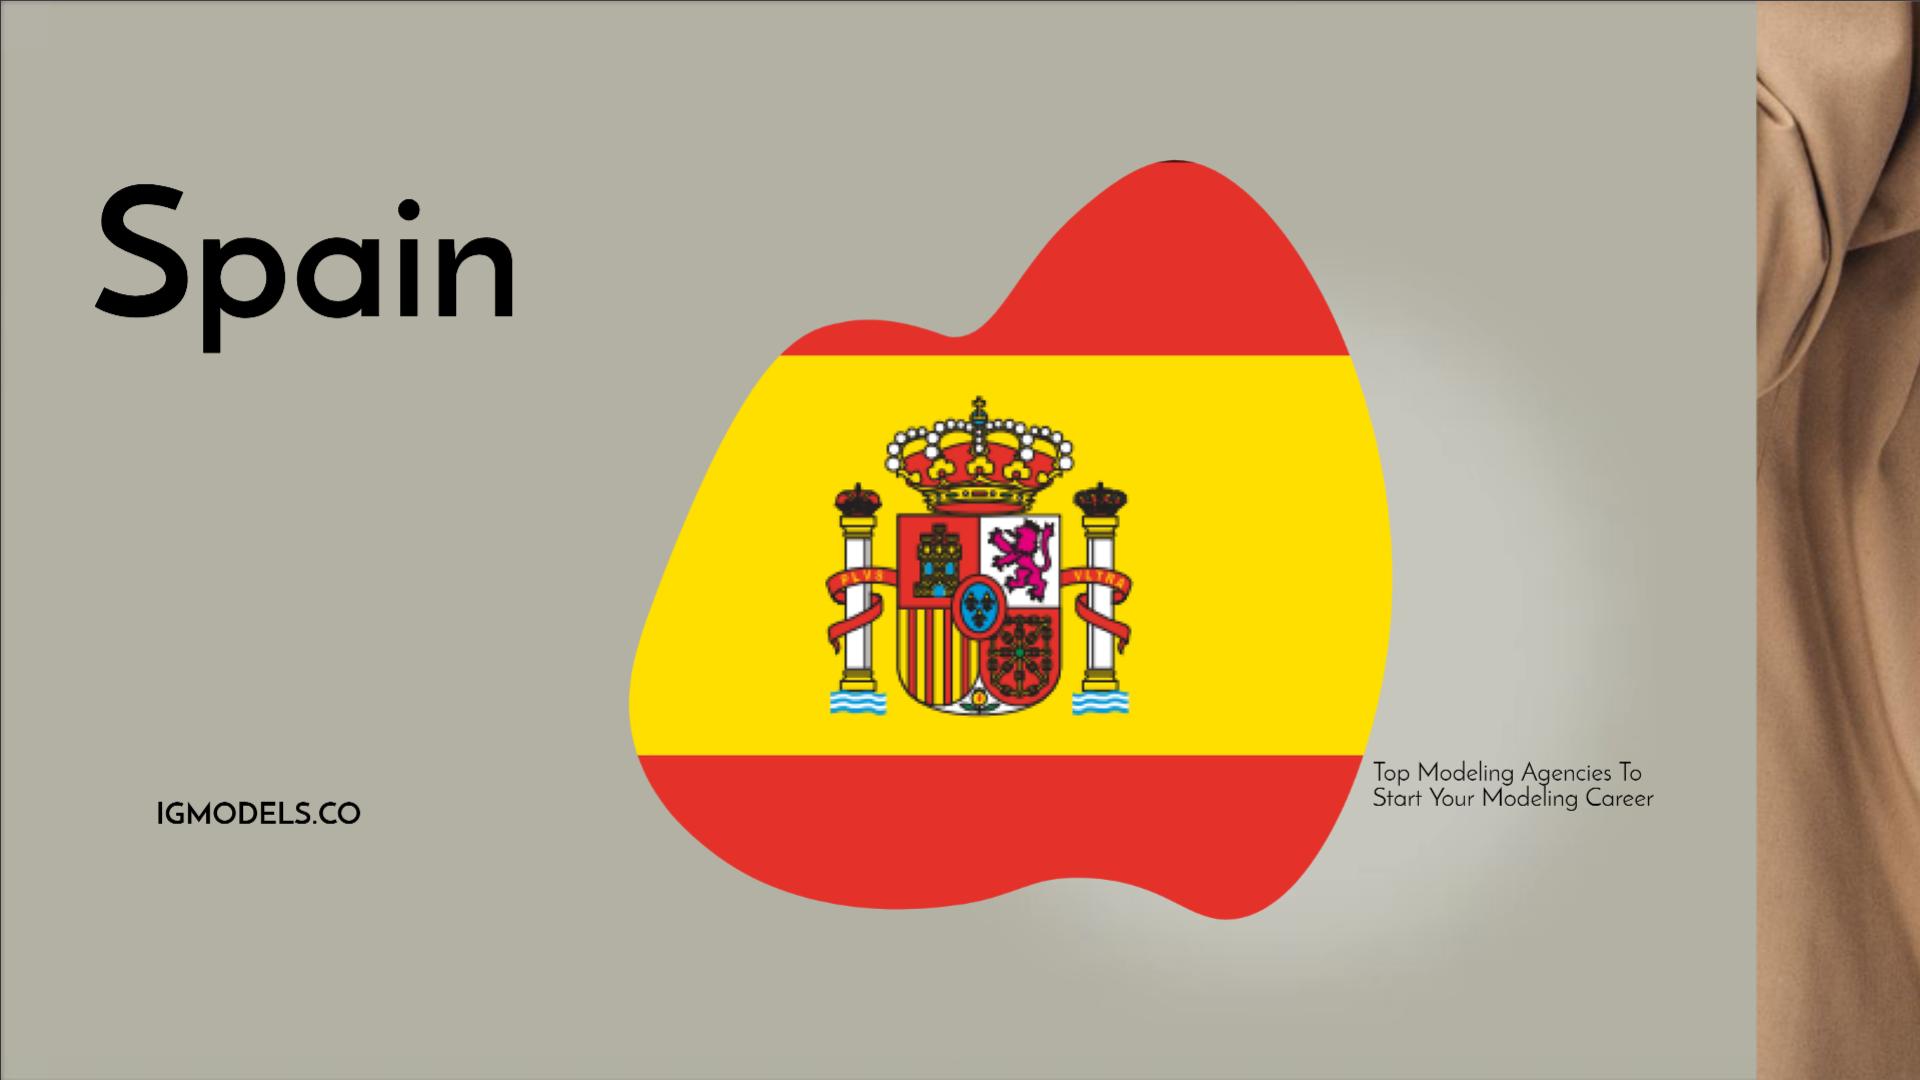 List : Top 35 Modeling Agencies In Spain To Start Your Modeling Career In 2021